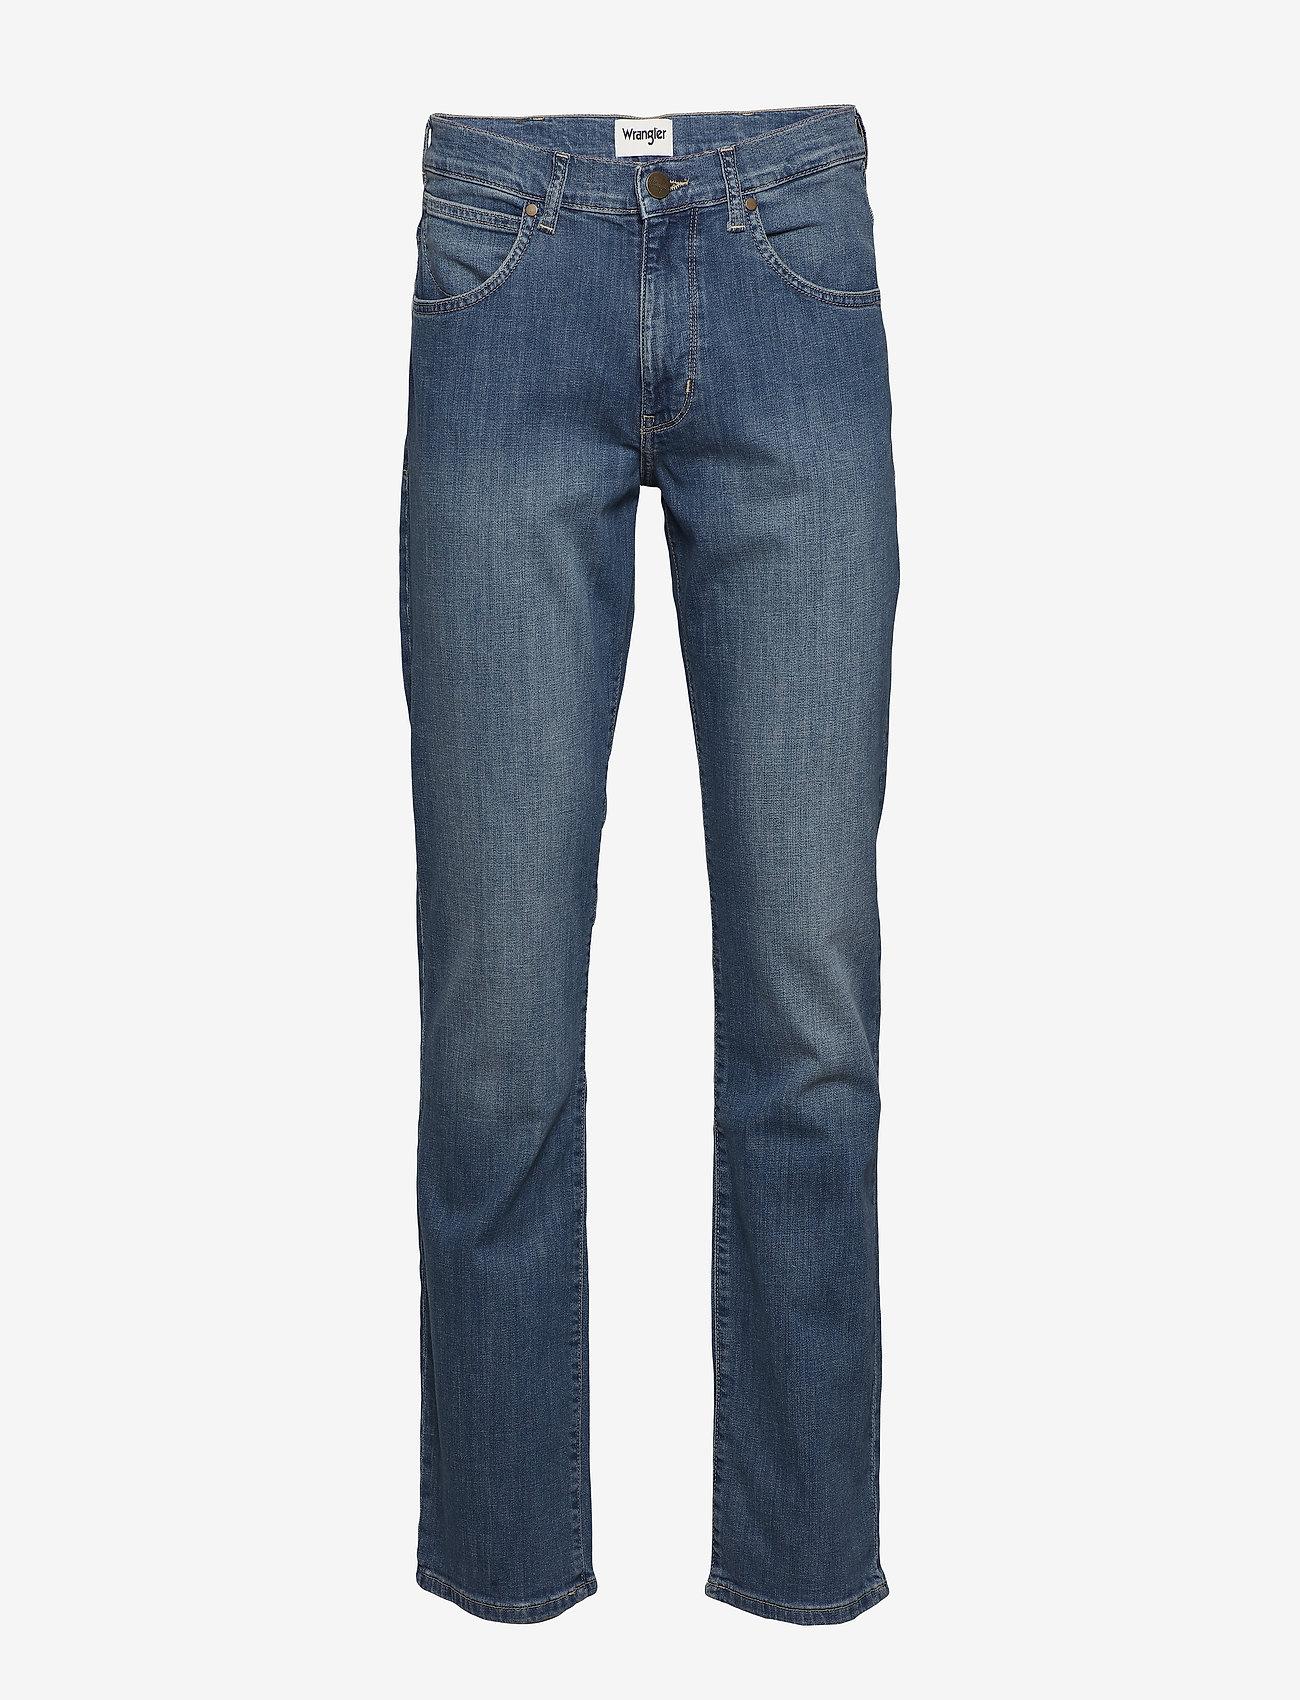 Wrangler - ARIZONA - regular jeans - dark vent